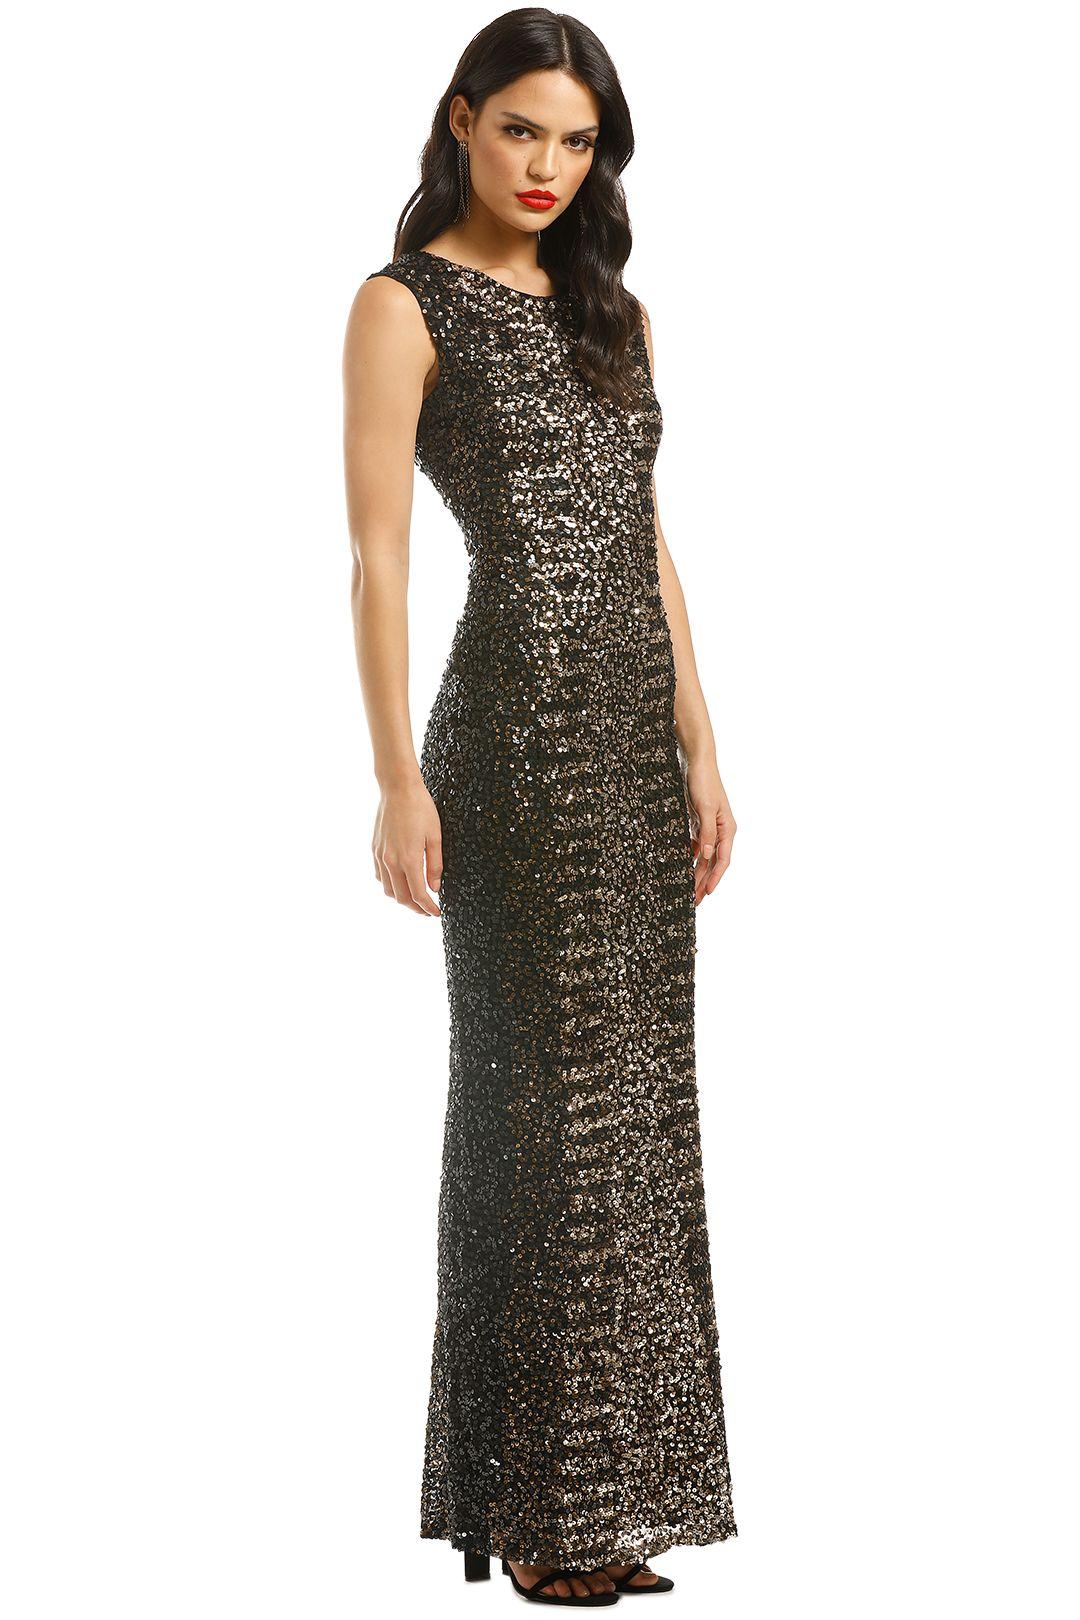 Grace-and-Blaze-Oscar-Gown-Side